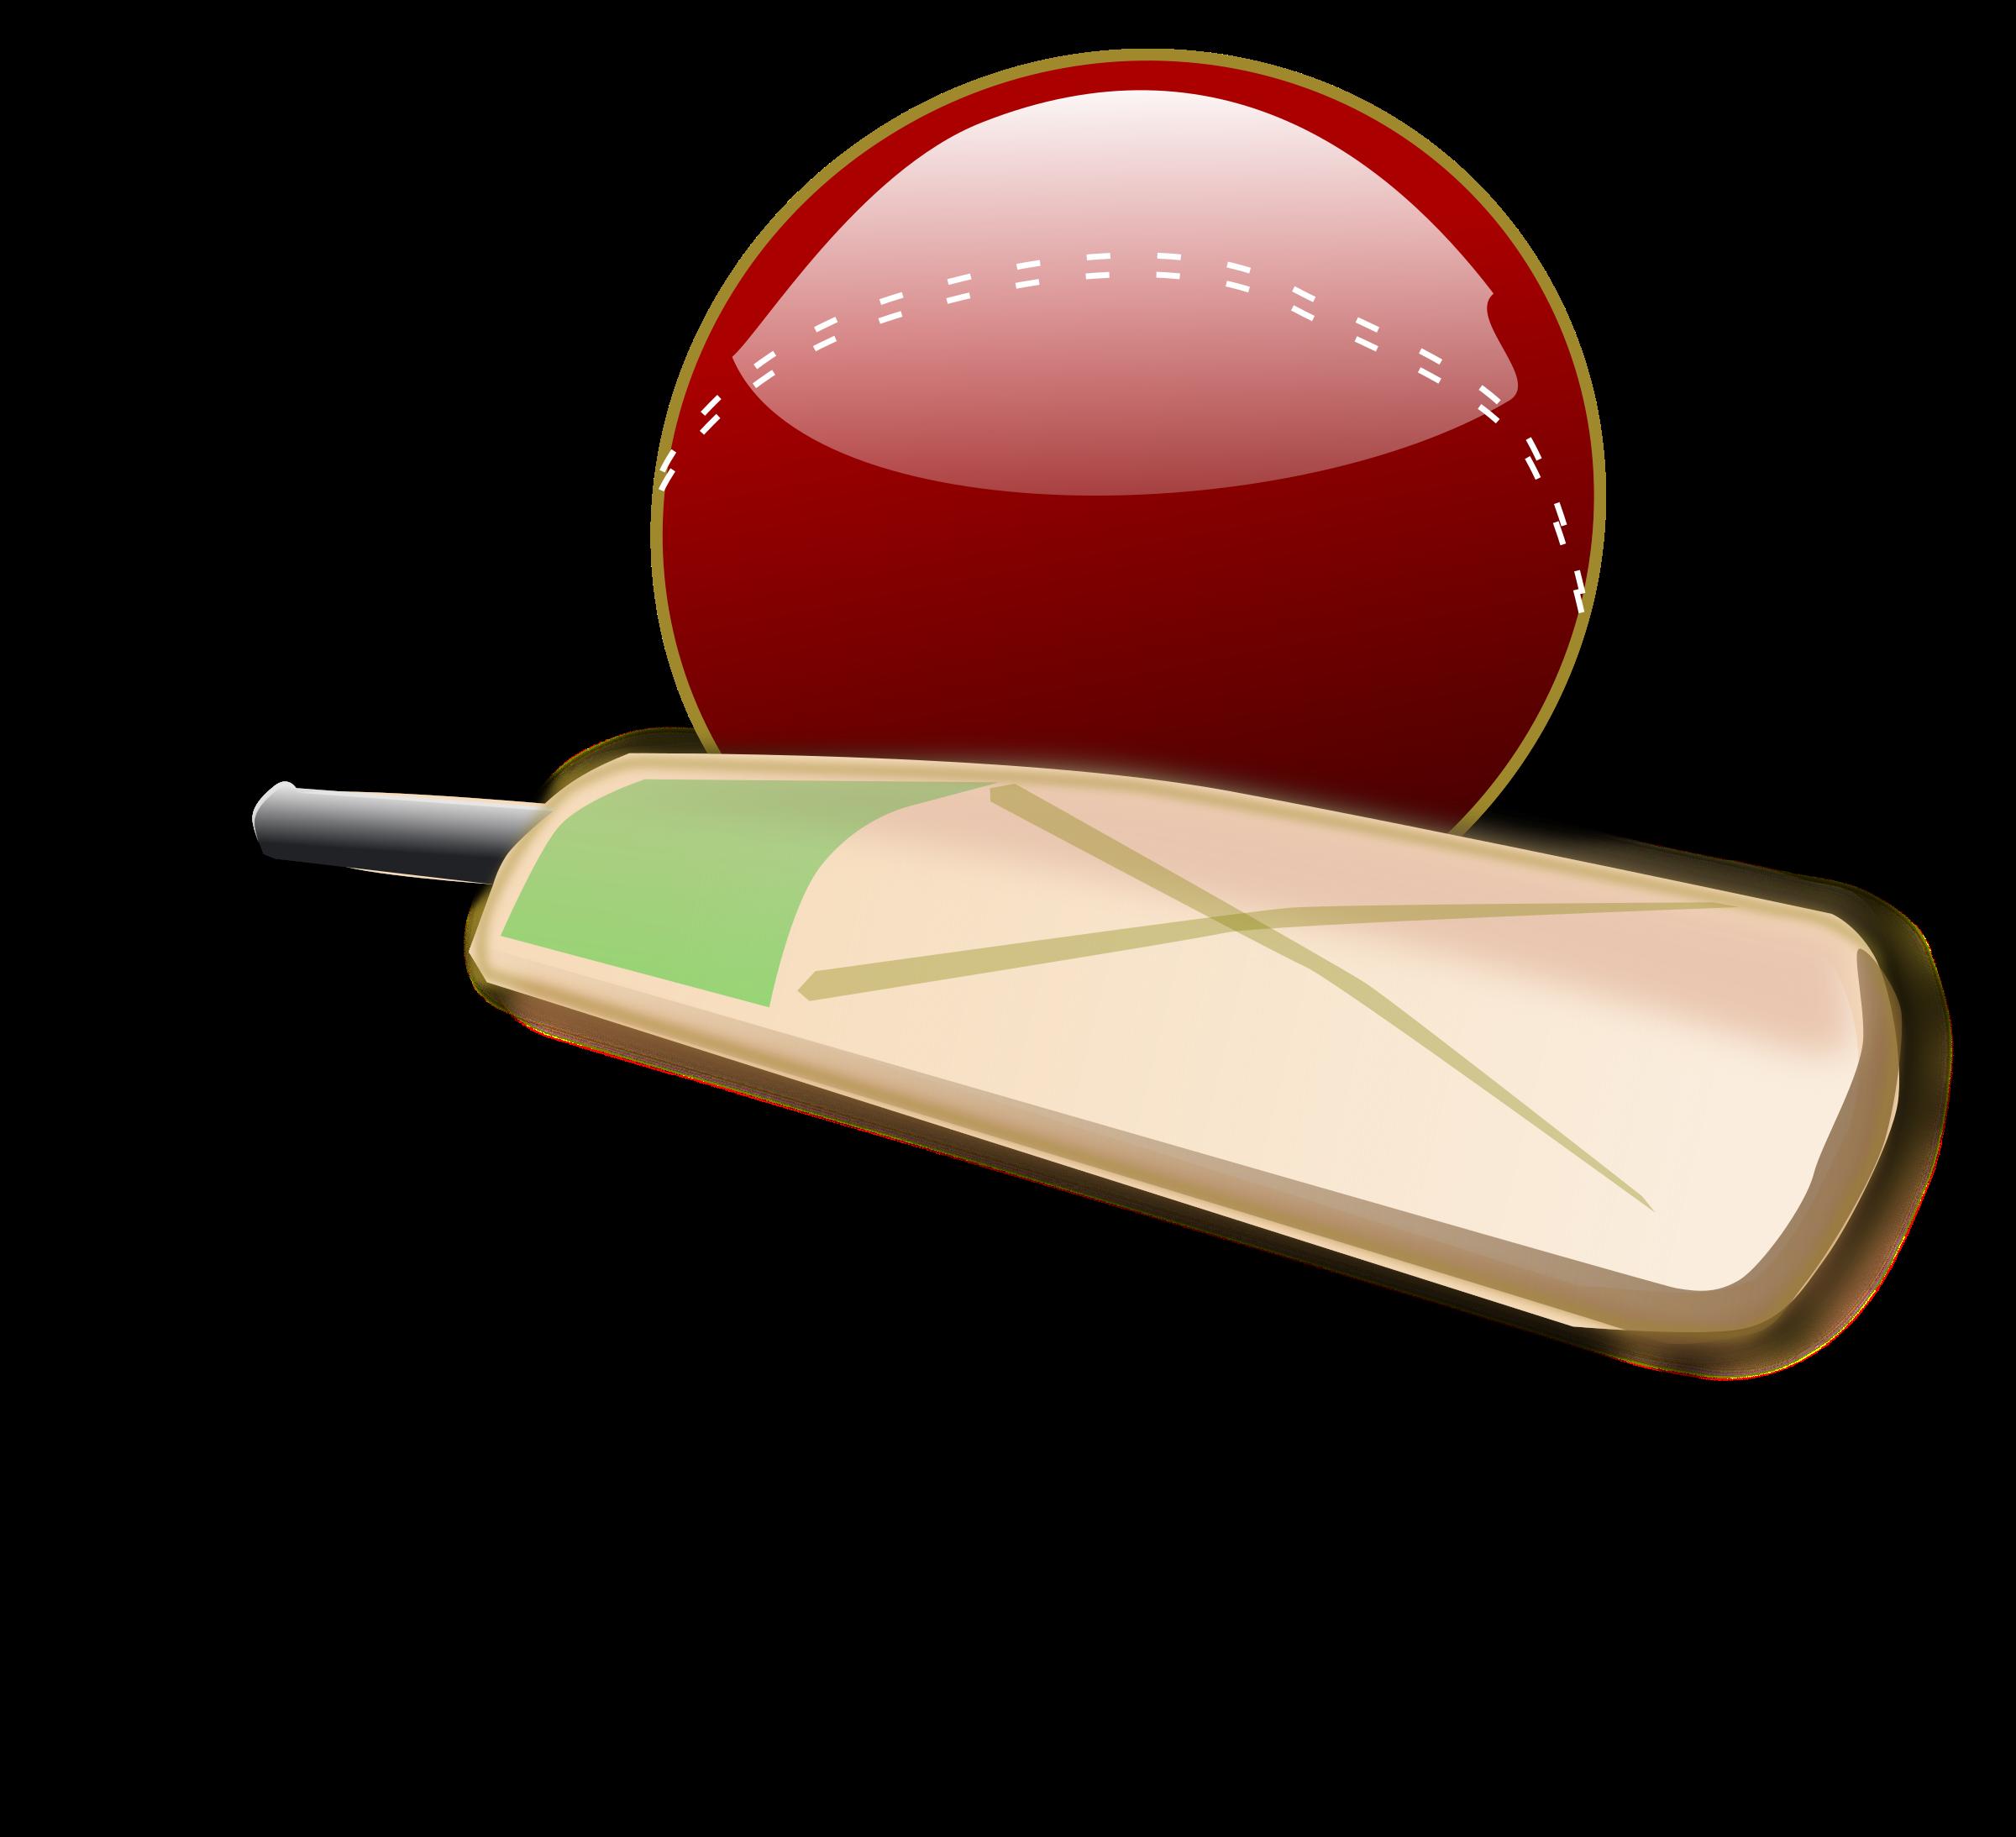 Game clipart cricket Cricket Clipart Cricket